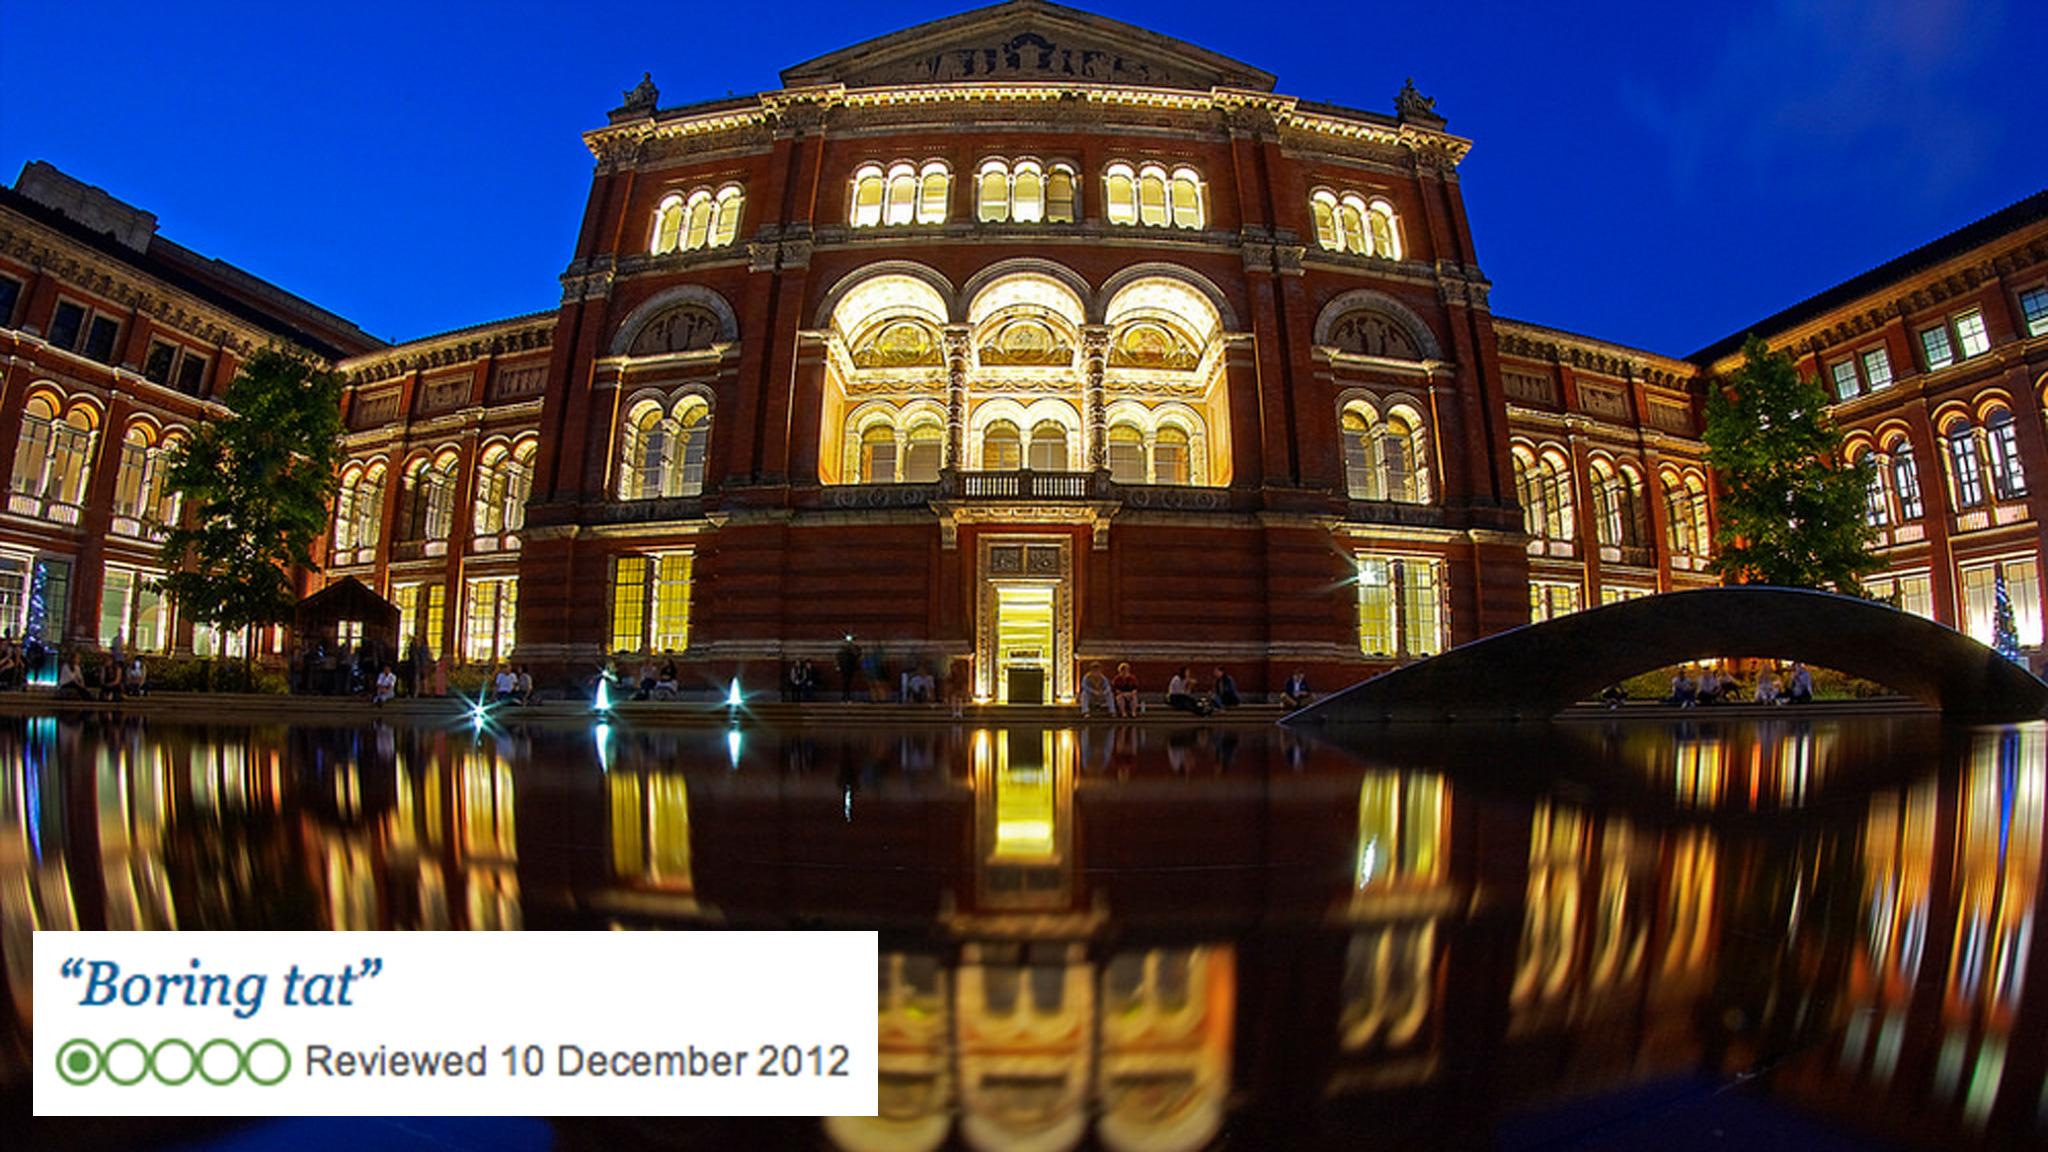 Victoria & Albert Museum TripAdvisor review